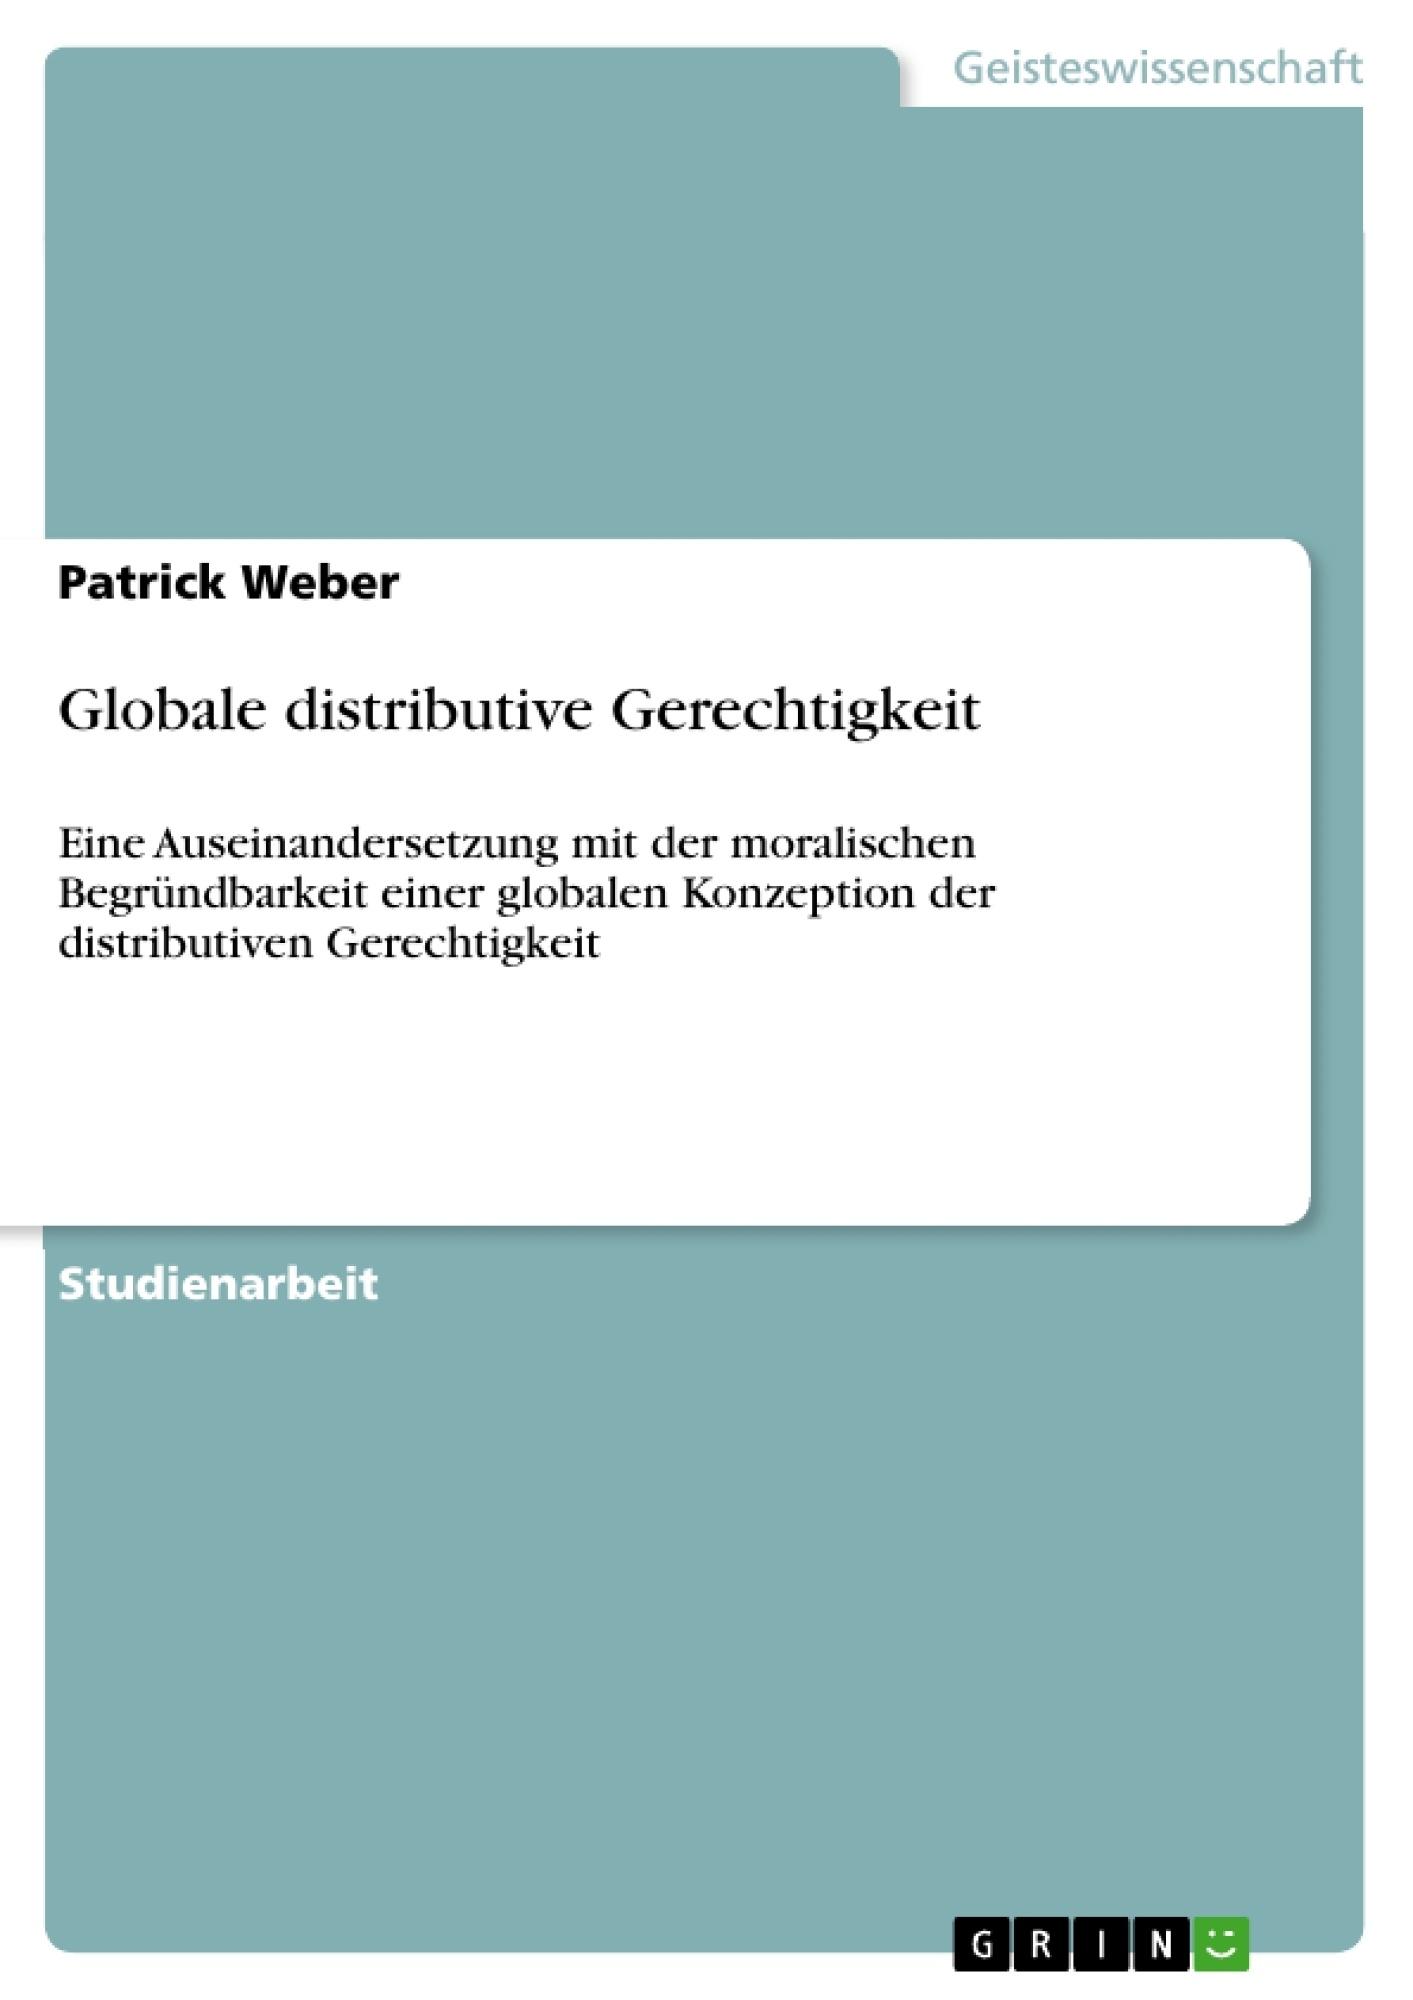 Titel: Globale distributive Gerechtigkeit